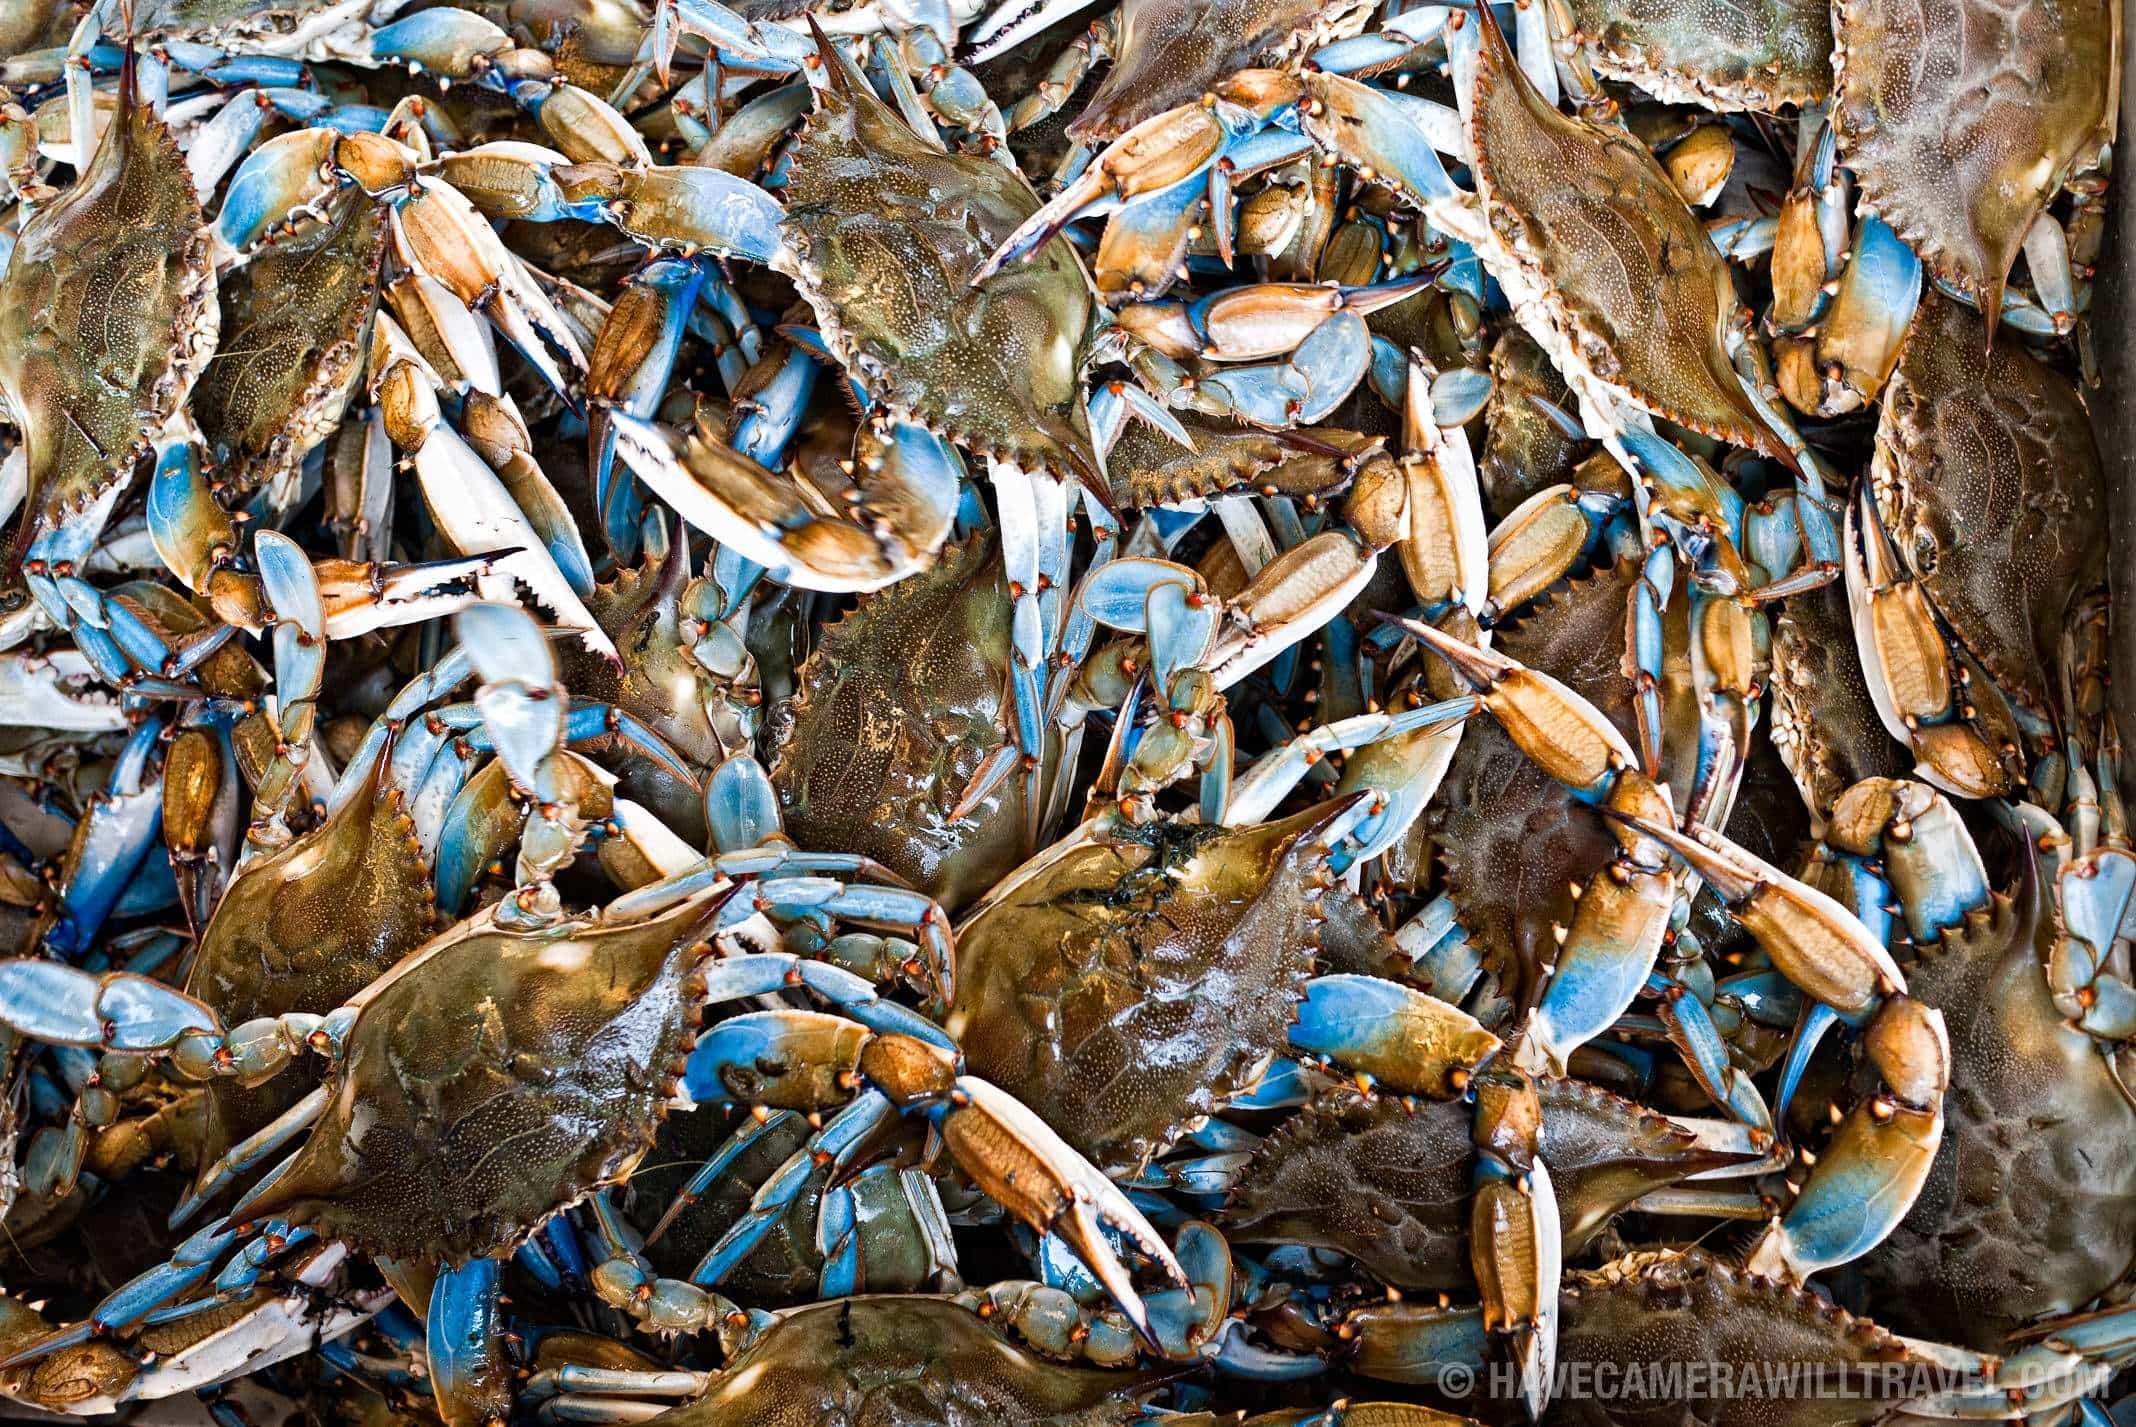 Maine avenue fish market washington dc photo guide for Waterfront dc fish market